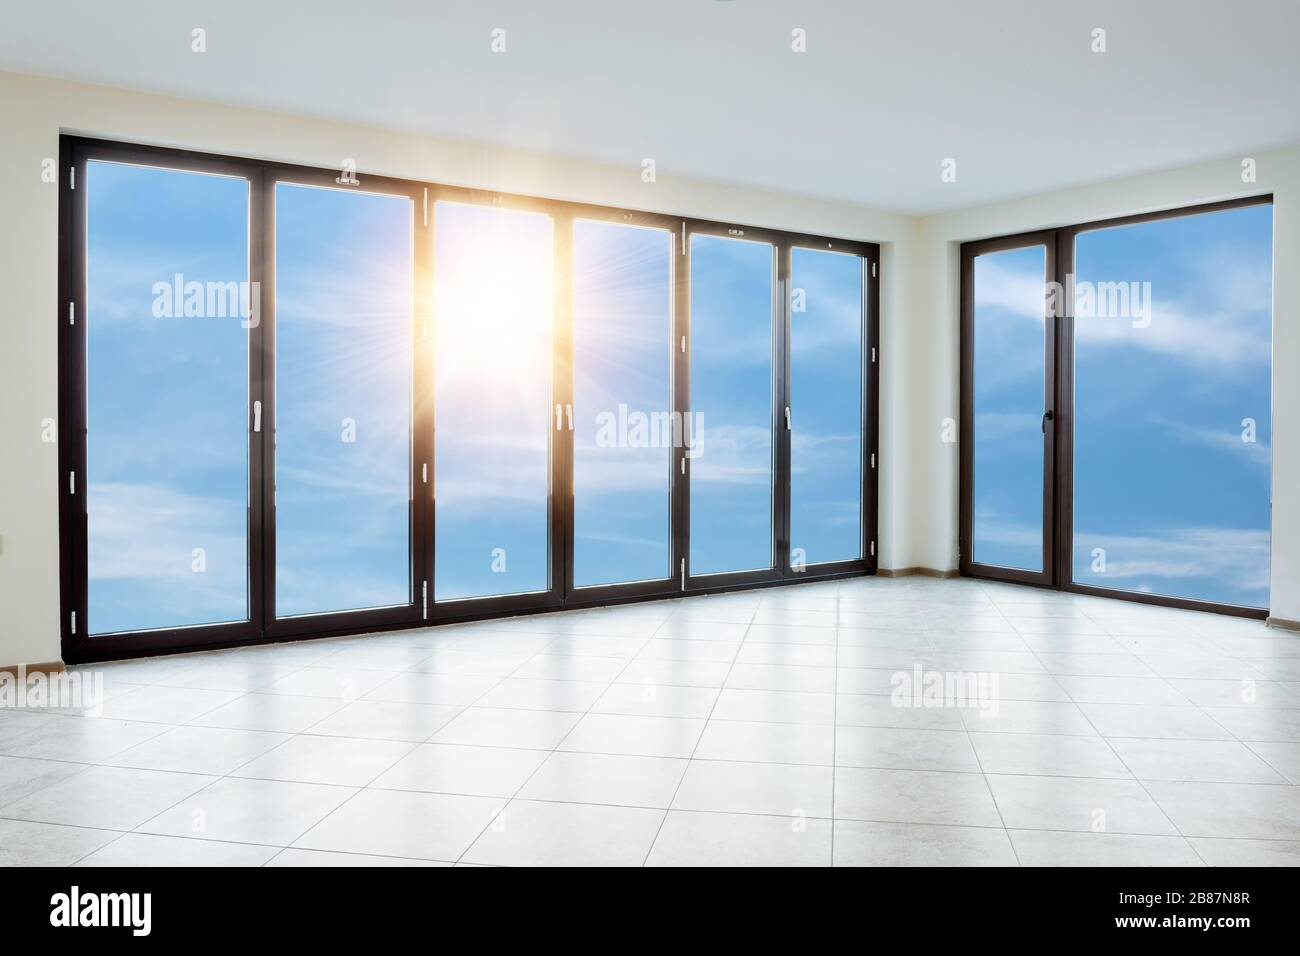 Empty white room with windows Stock Photo